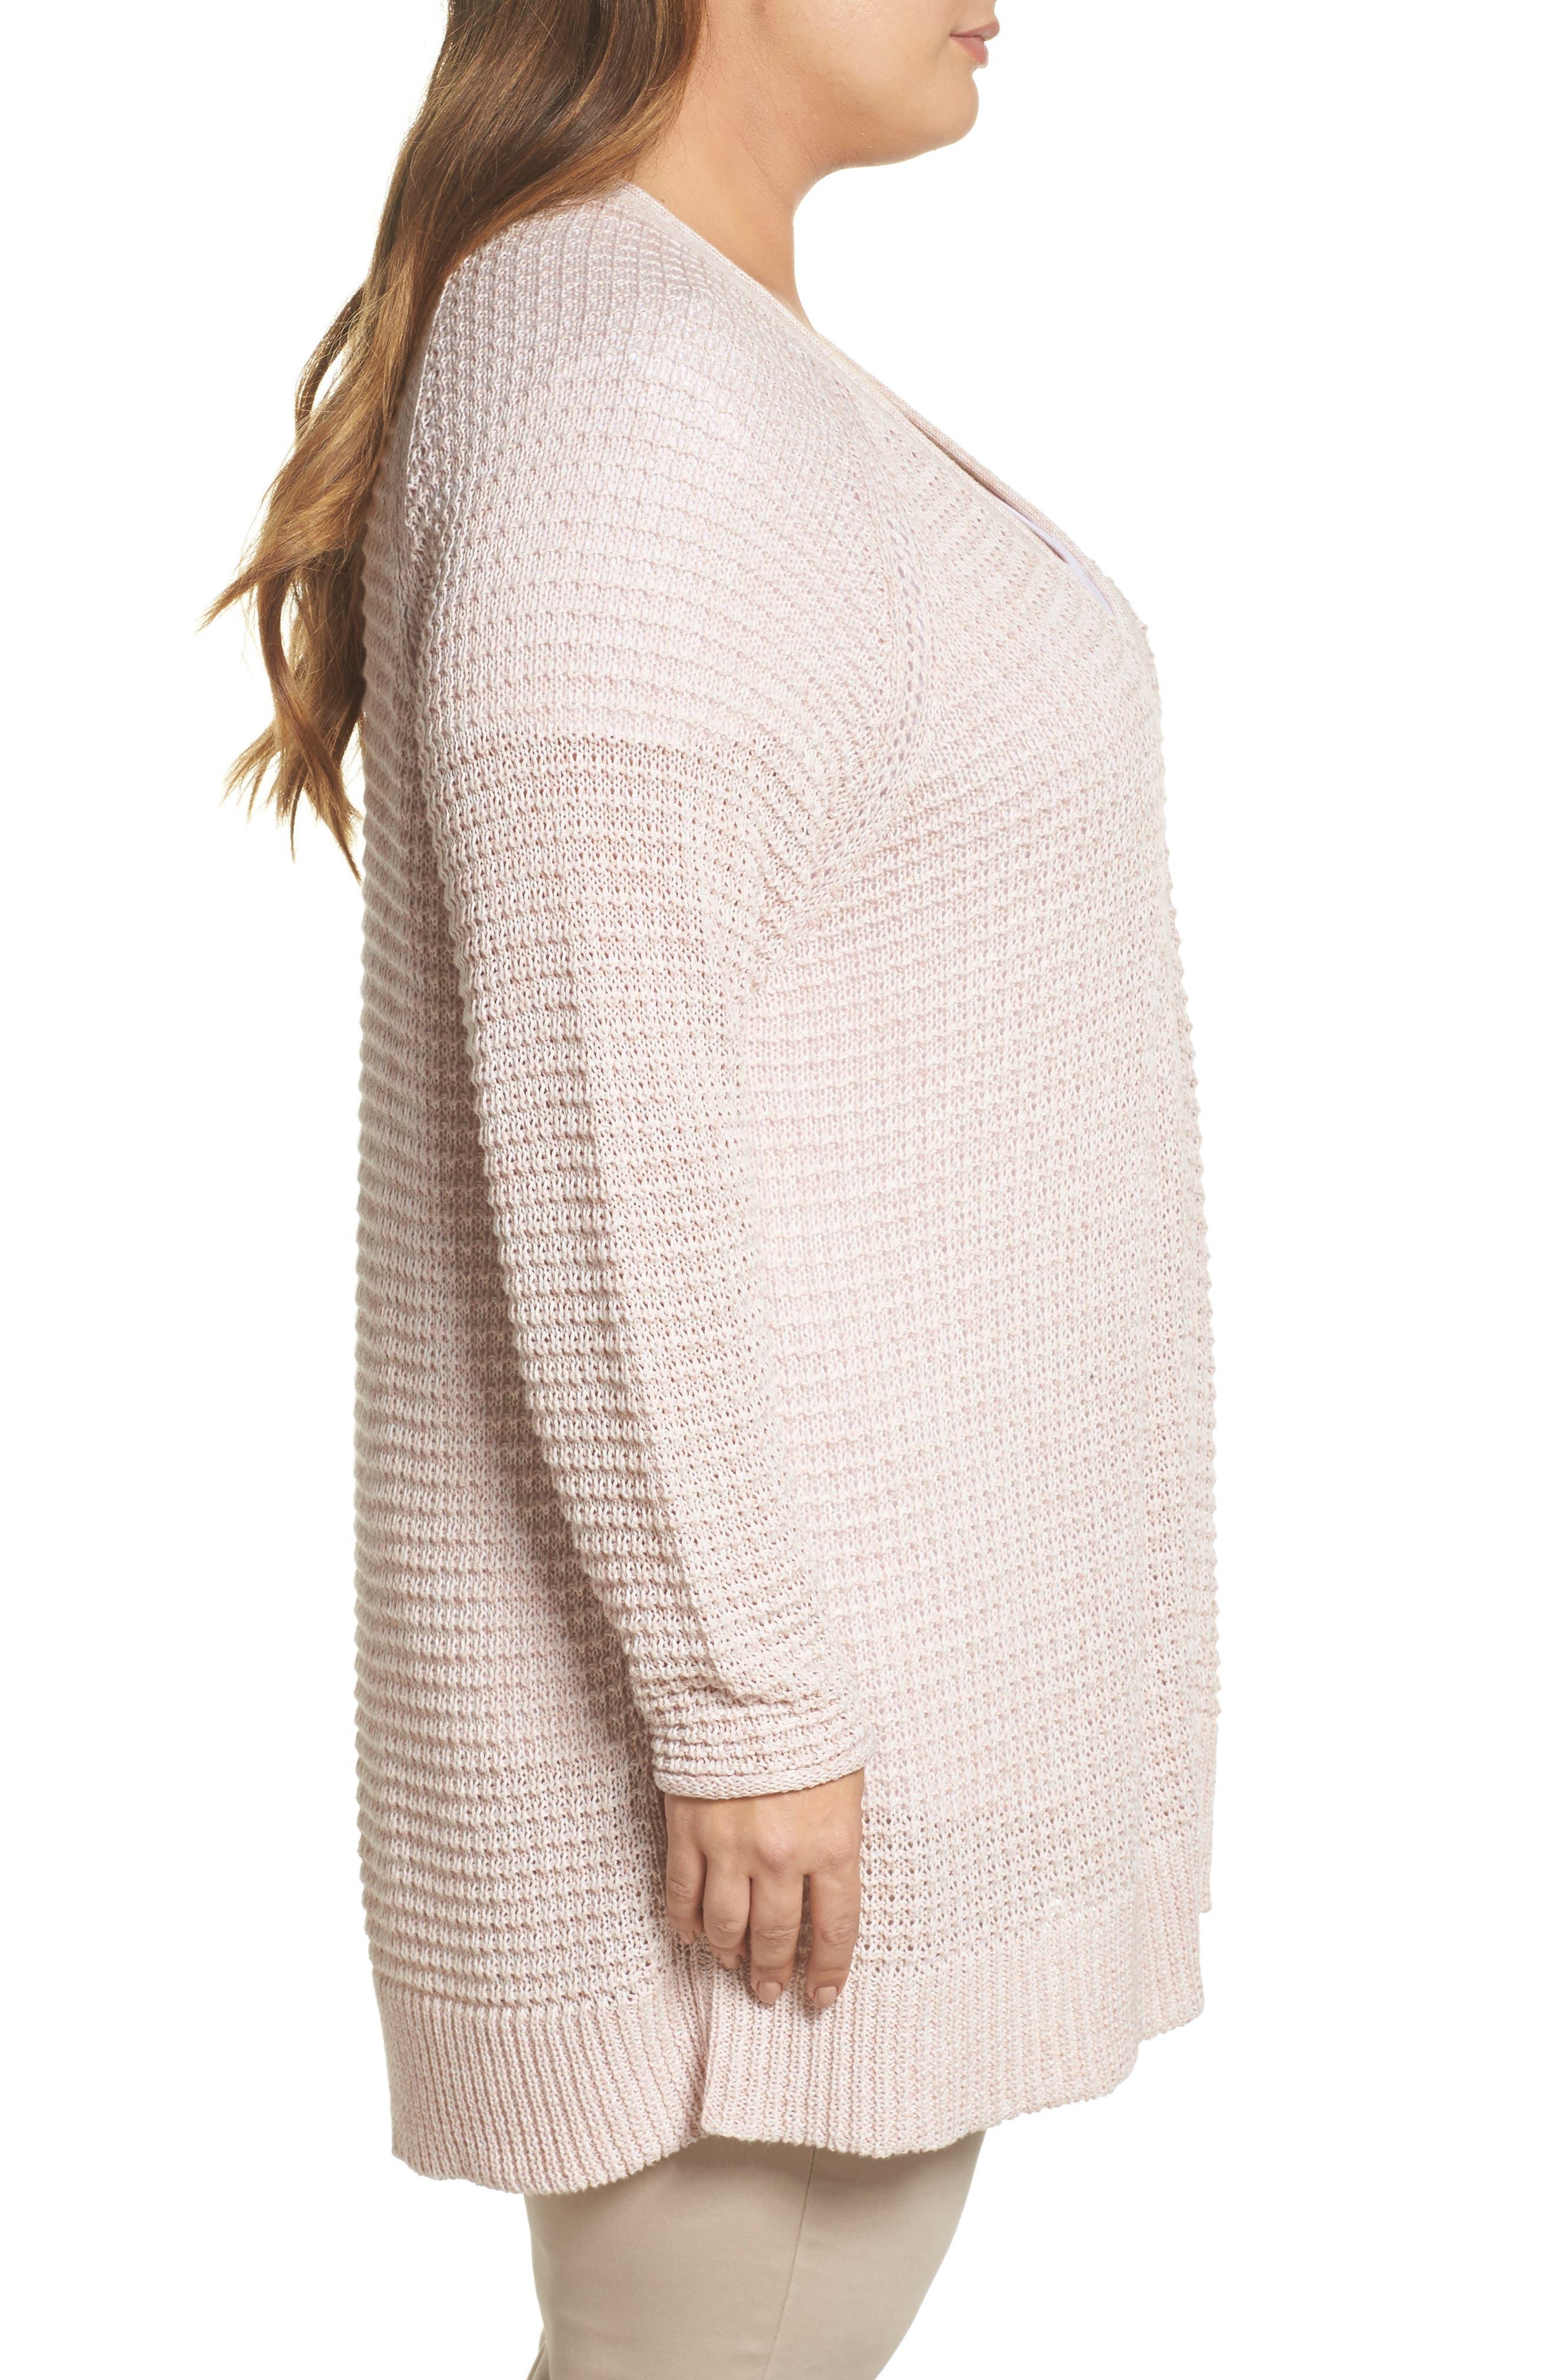 Easy Knit Cardigan,                             Alternate thumbnail 3, color,                             Beige Linen Fern Marl